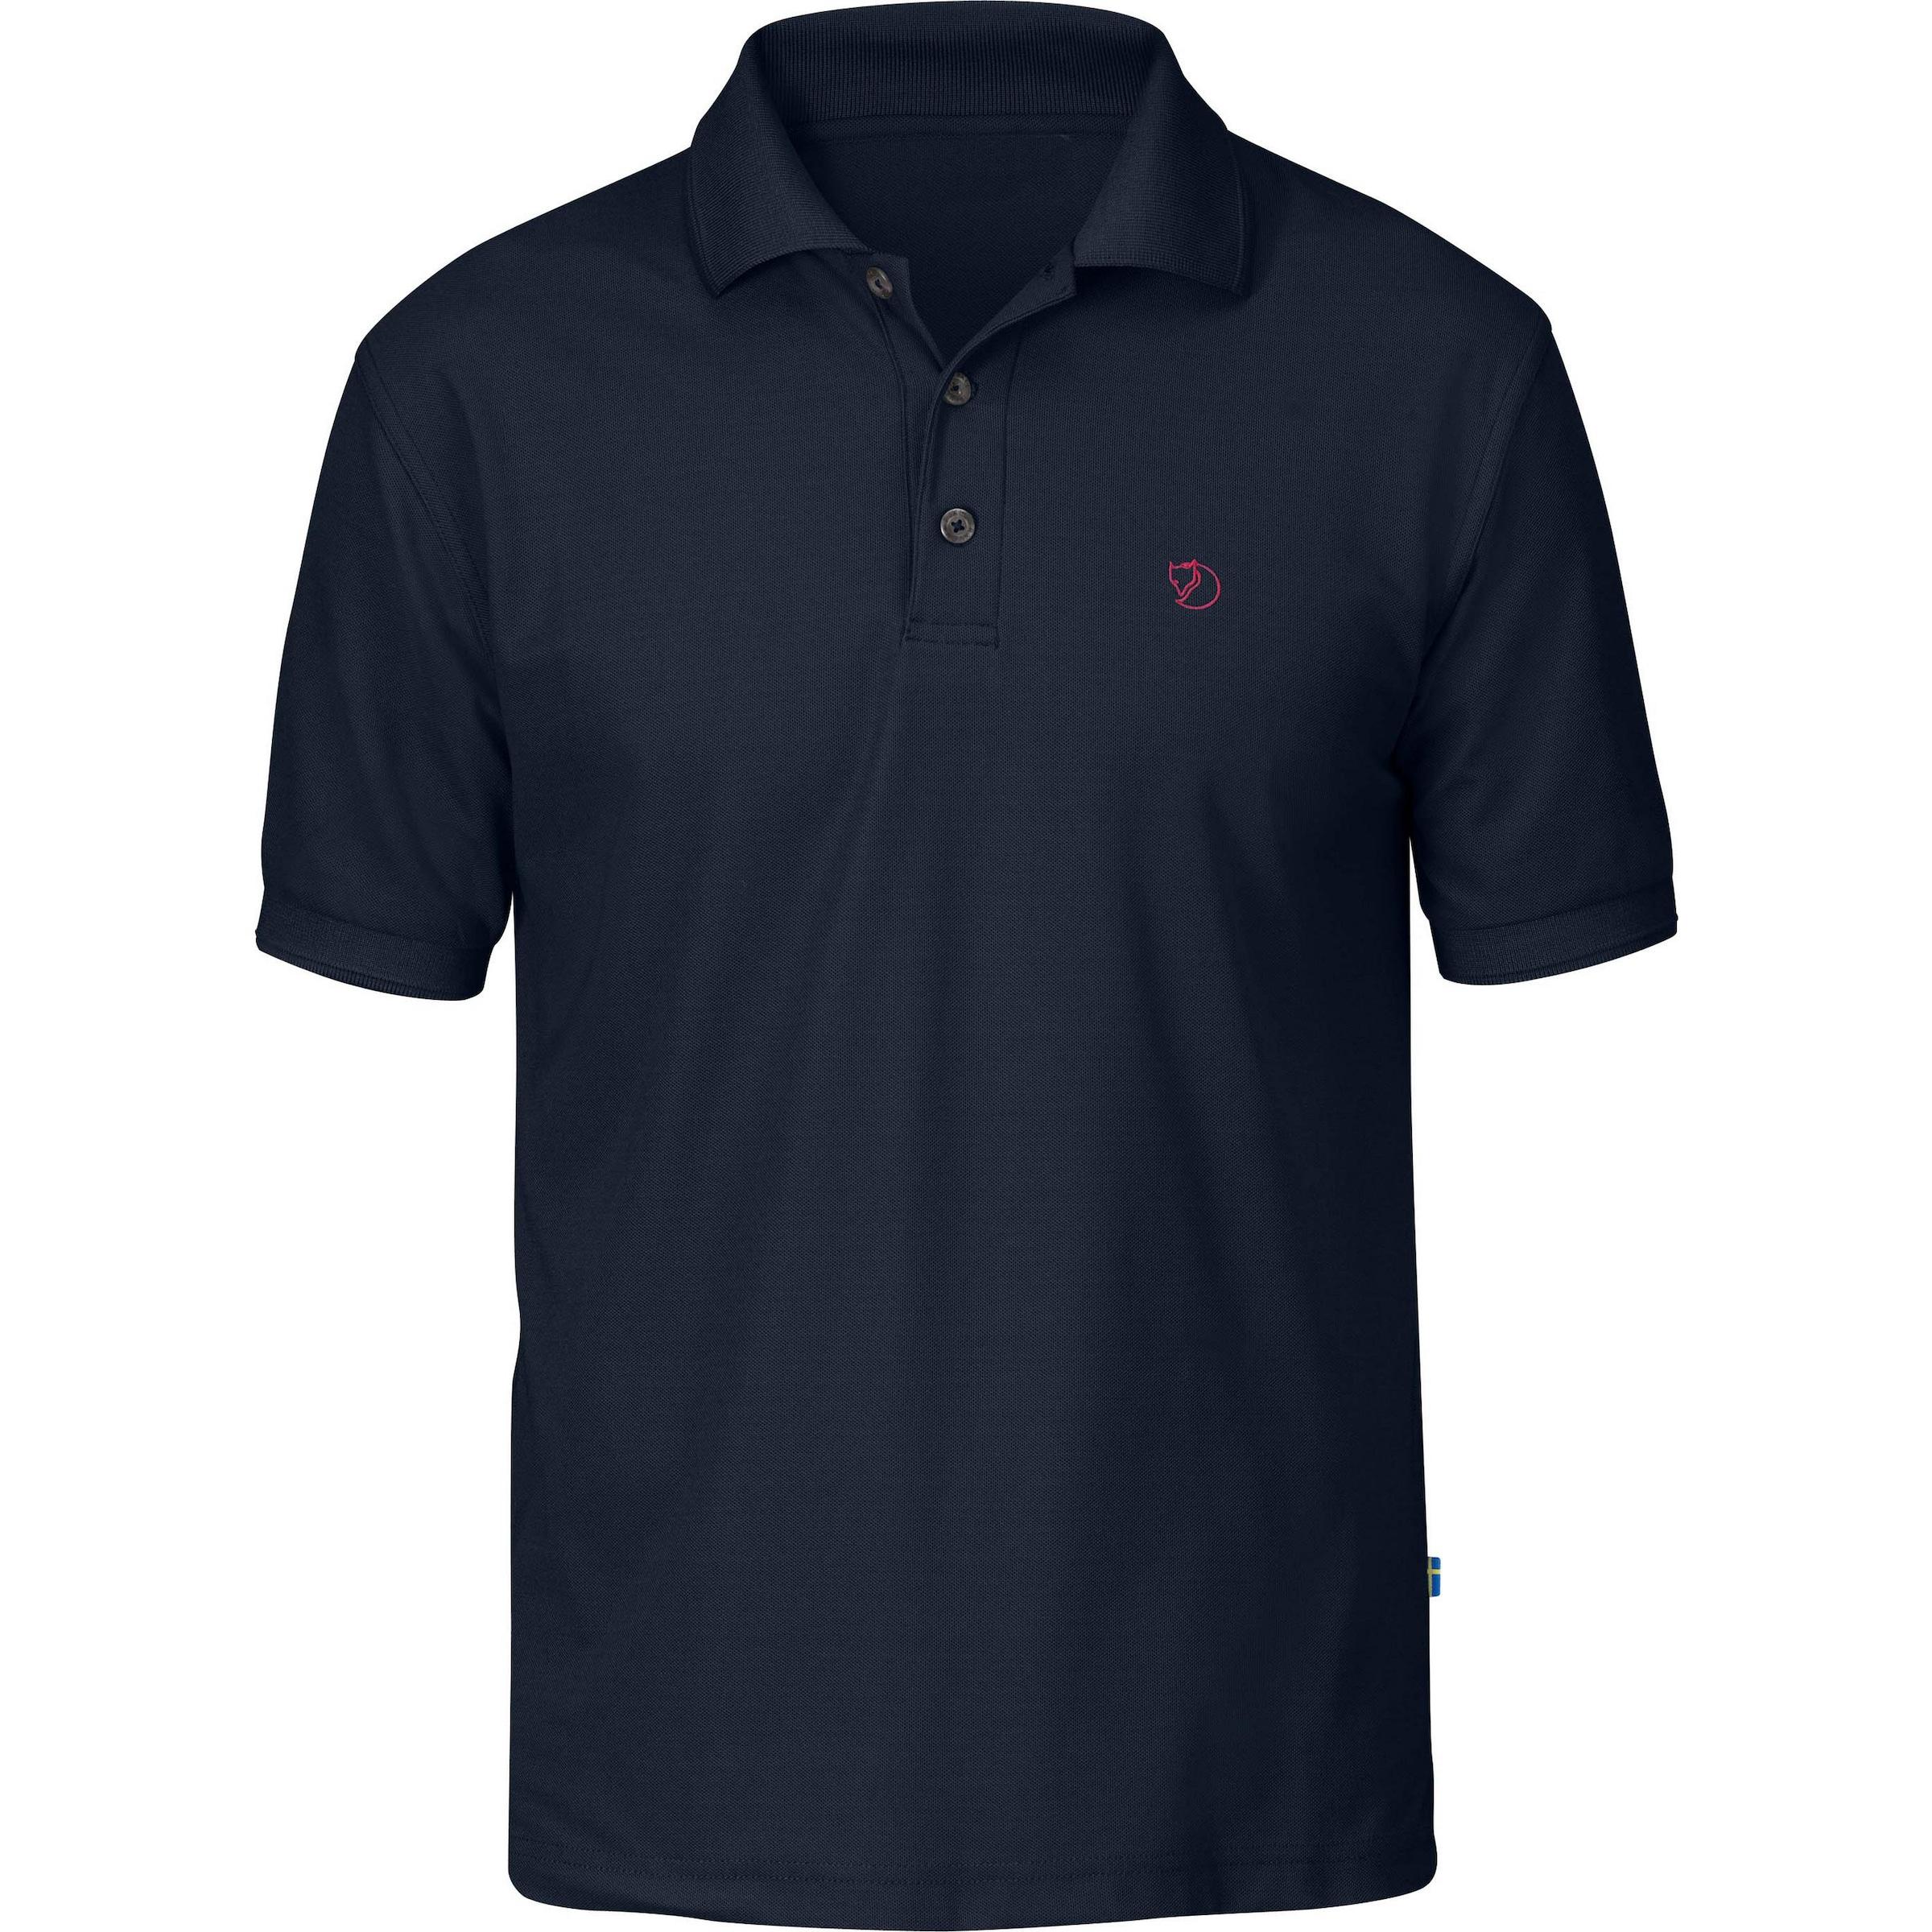 Auslass Offiziellen Fjällräven 'Crowley Pique' Poloshirt Freies Verschiffen Verkauf 2018 Neueste cx5pReK